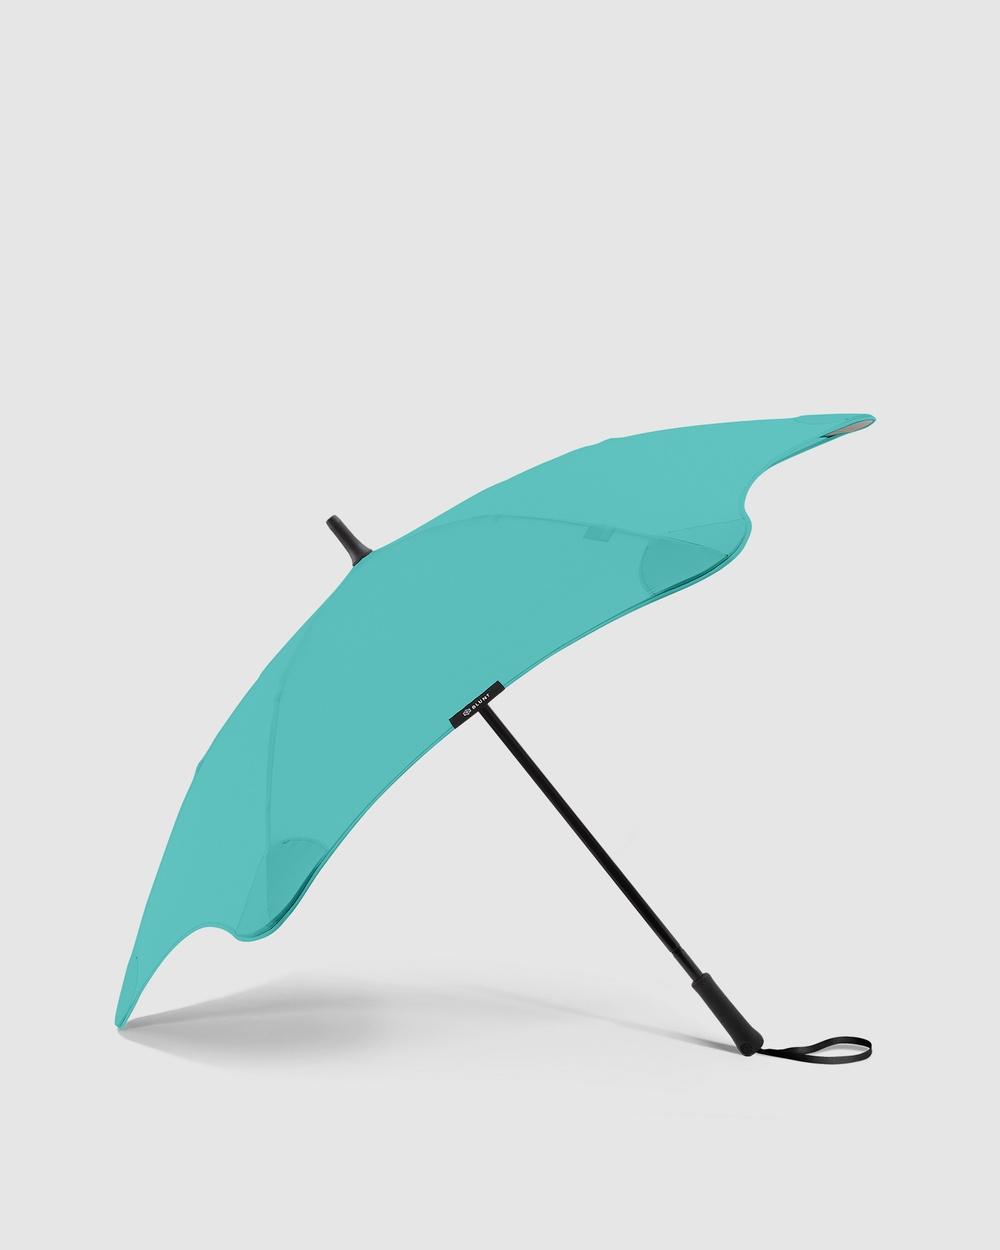 BLUNT Umbrellas Blunt Coupe Umbrella Accessories Mint